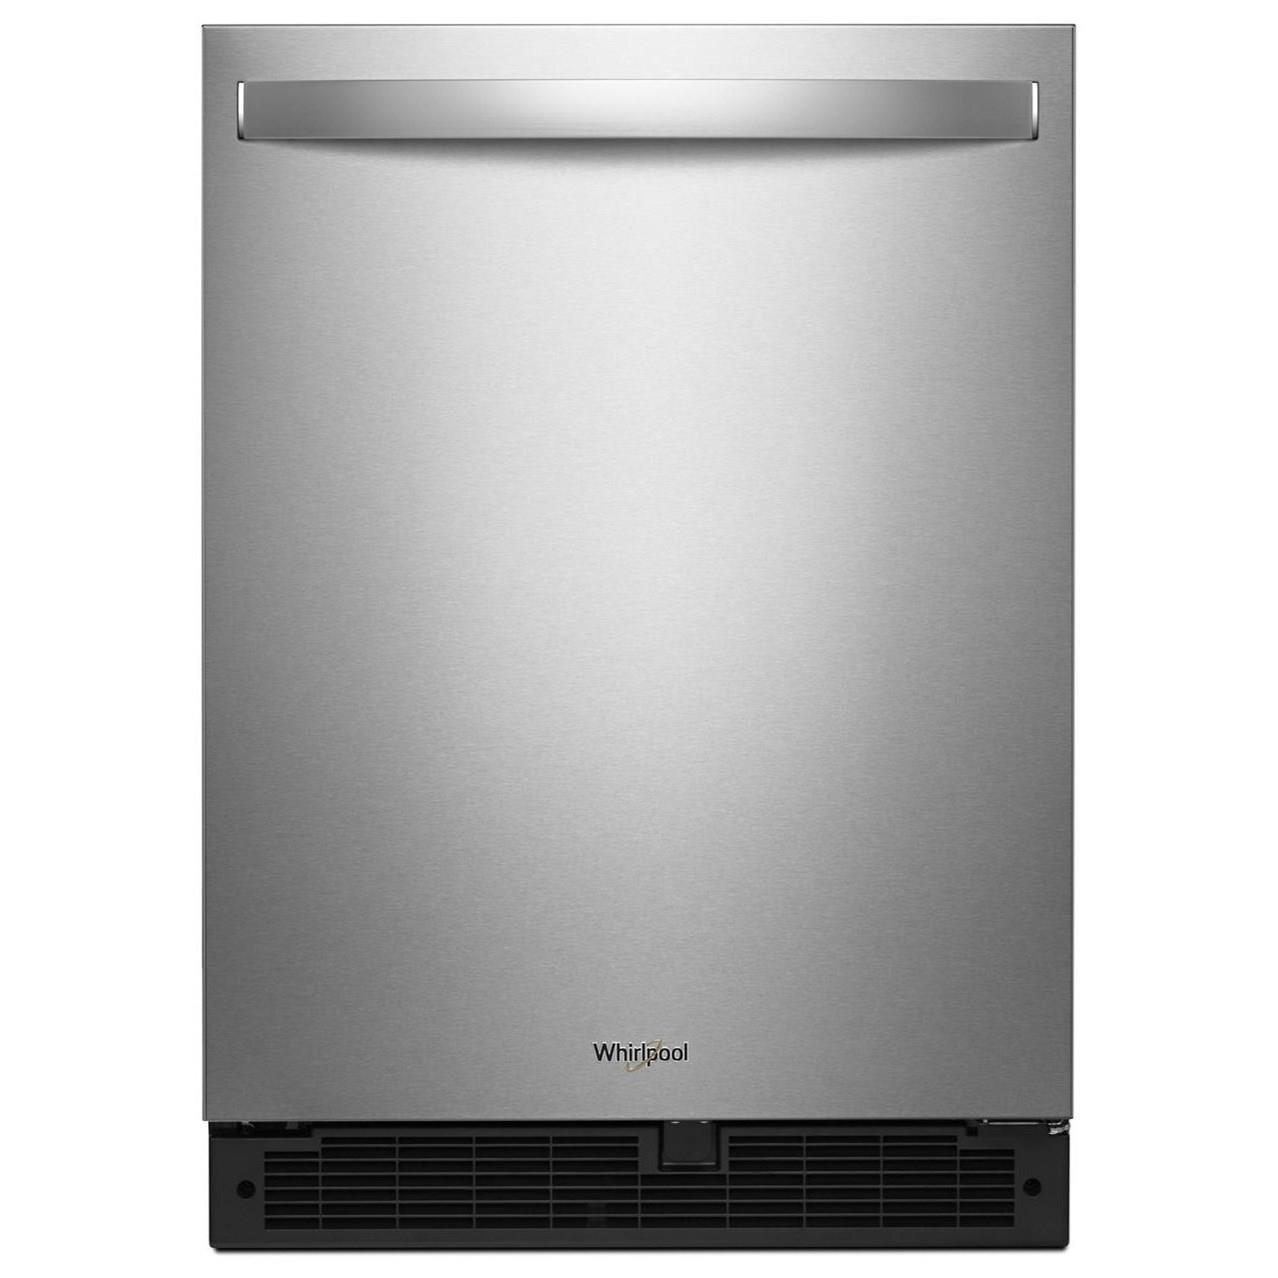 "Whirlpool All Refrigerators 5.1 Cu. Ft. 24"" Undercounter Refrigerator - Item Number: WUR50X24HZ"